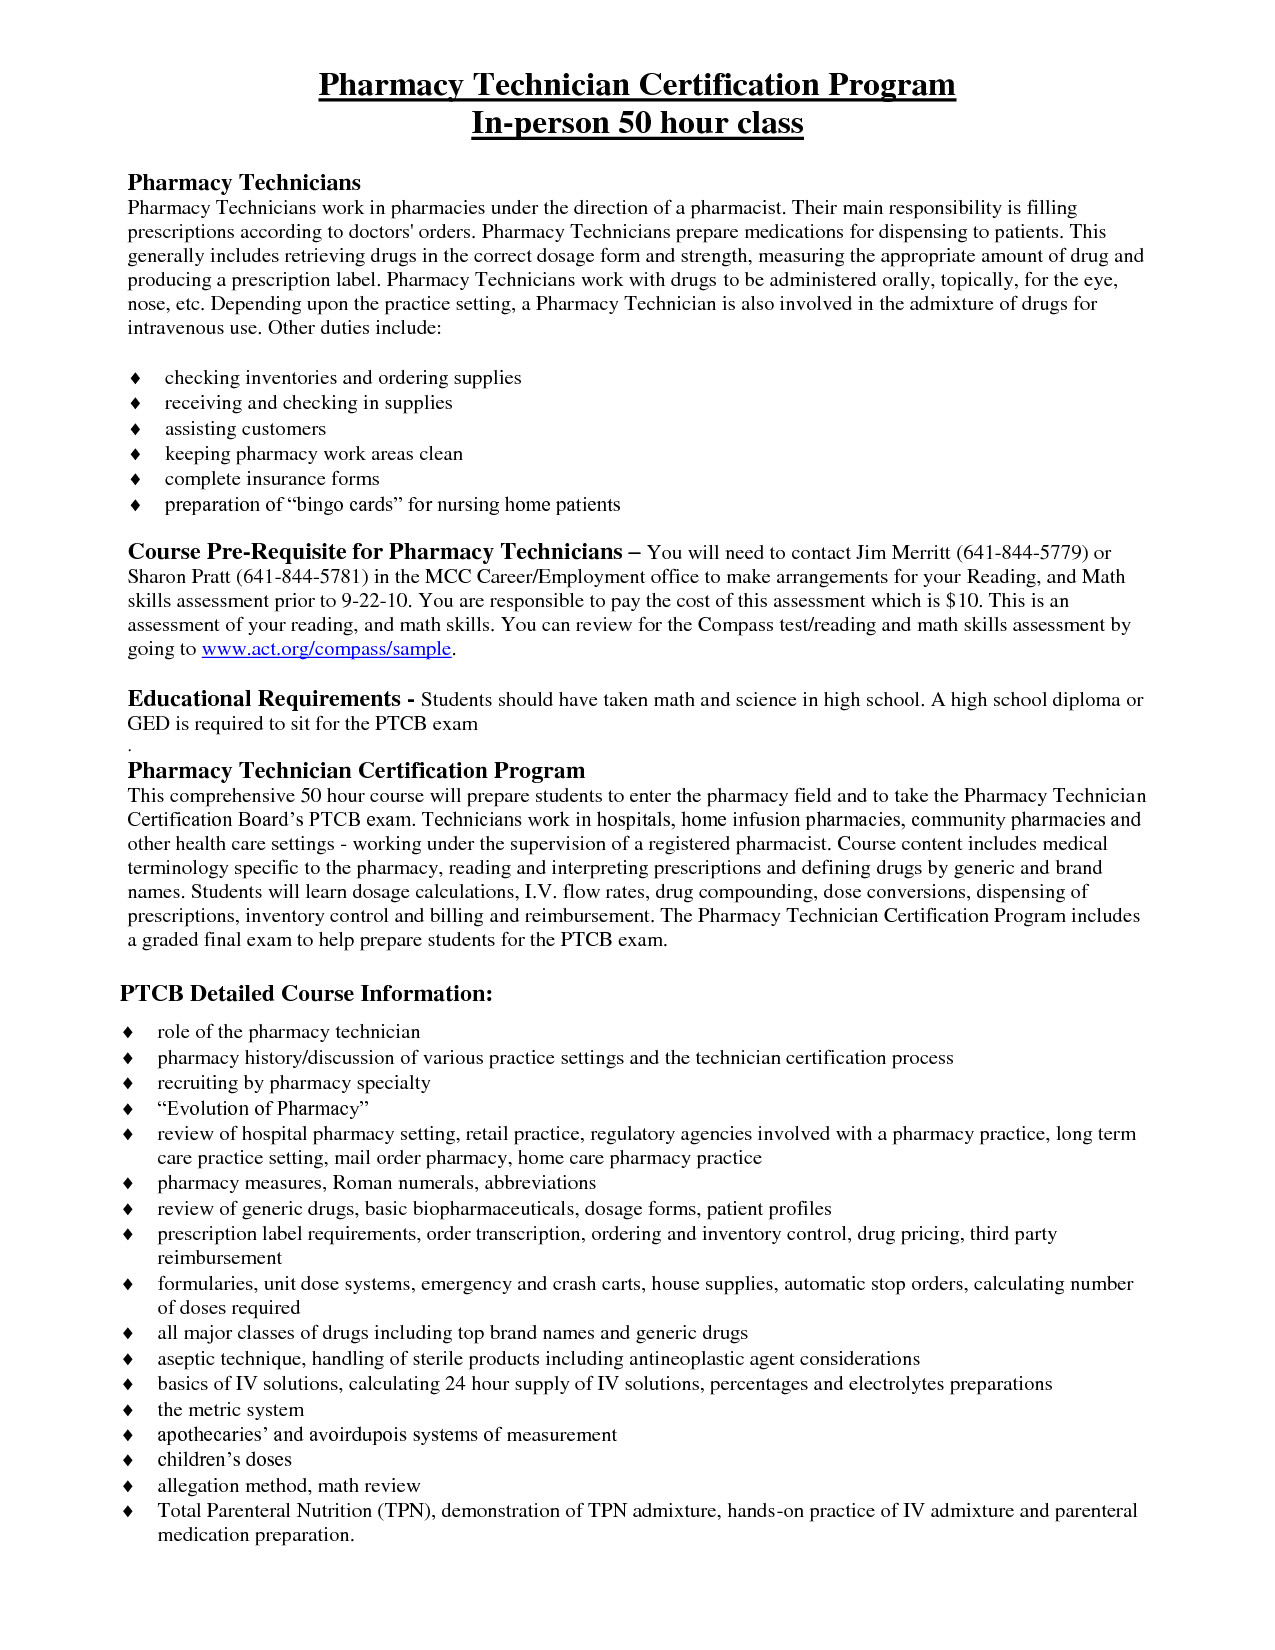 certified pharmacy technician resume